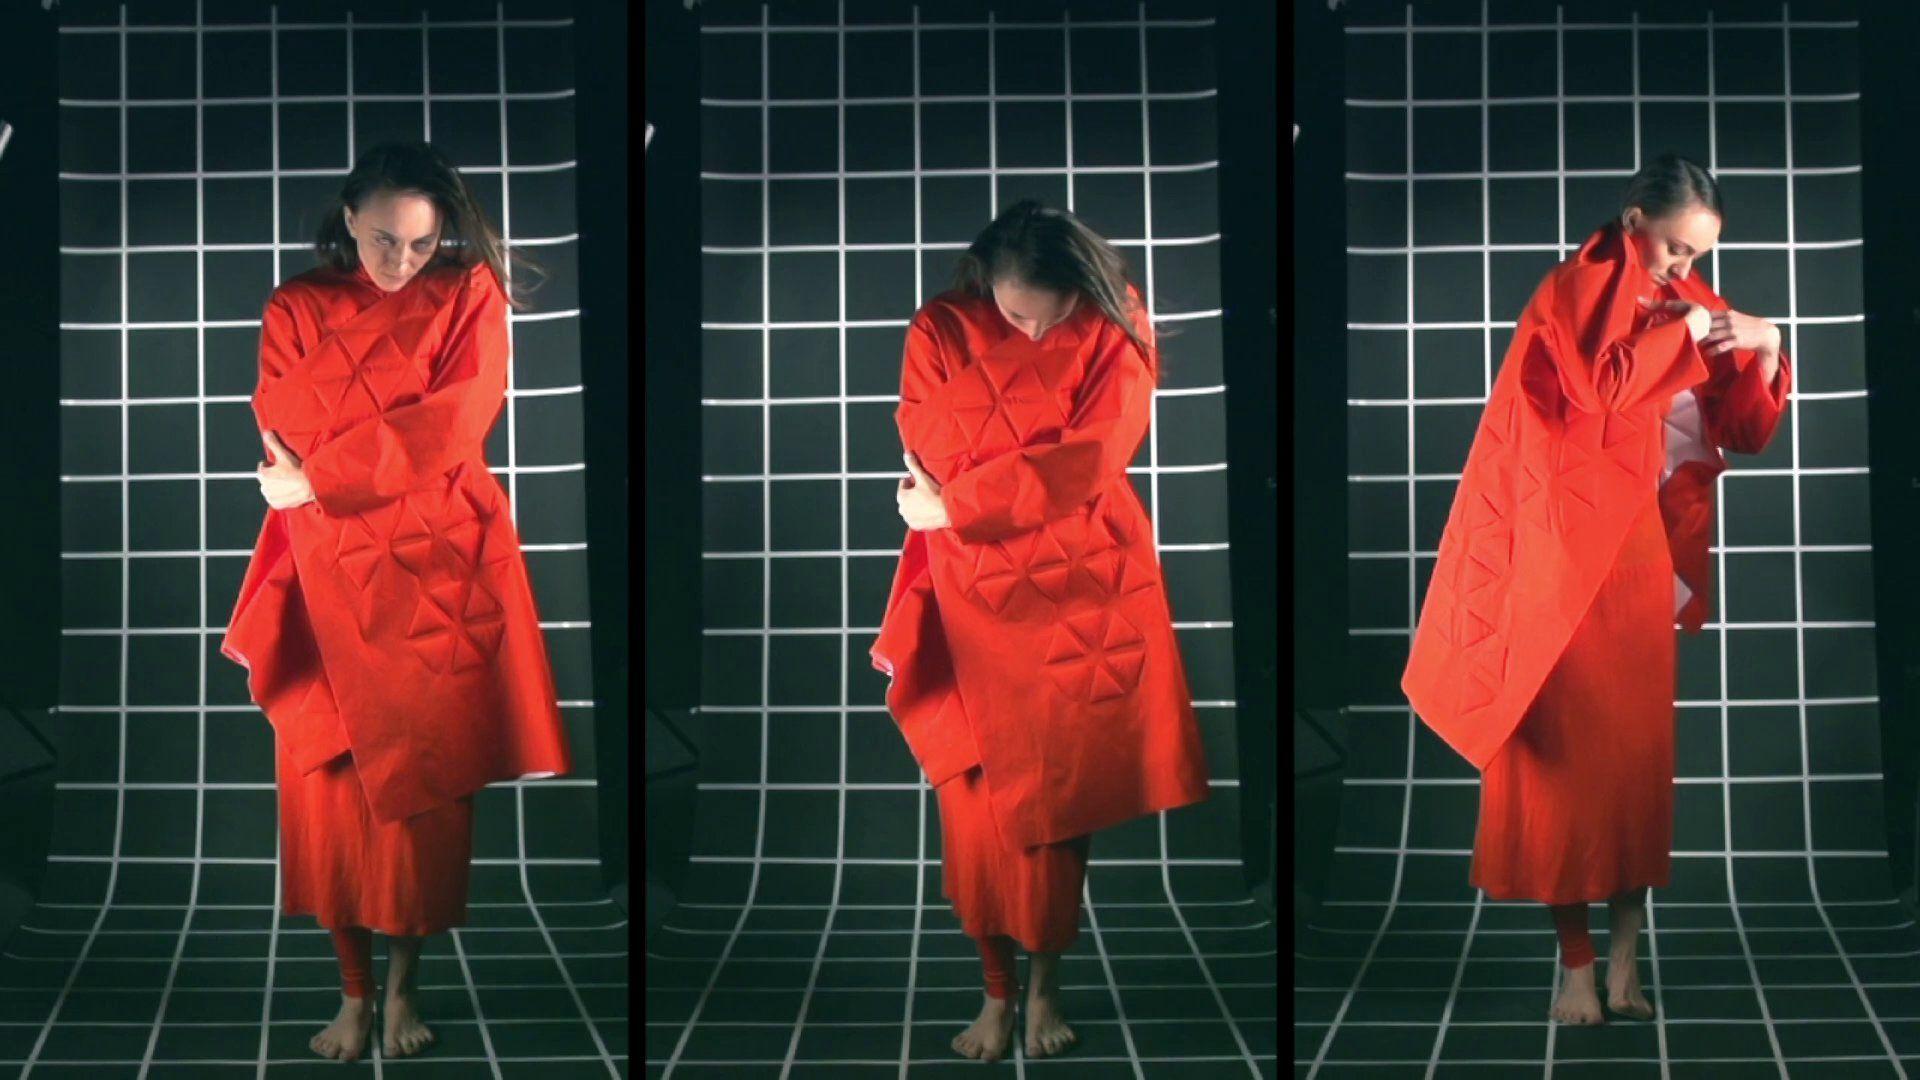 Fashion film de Cuerpo Inminente, indumentaria inteligente por Daniela Toledo, 2014.